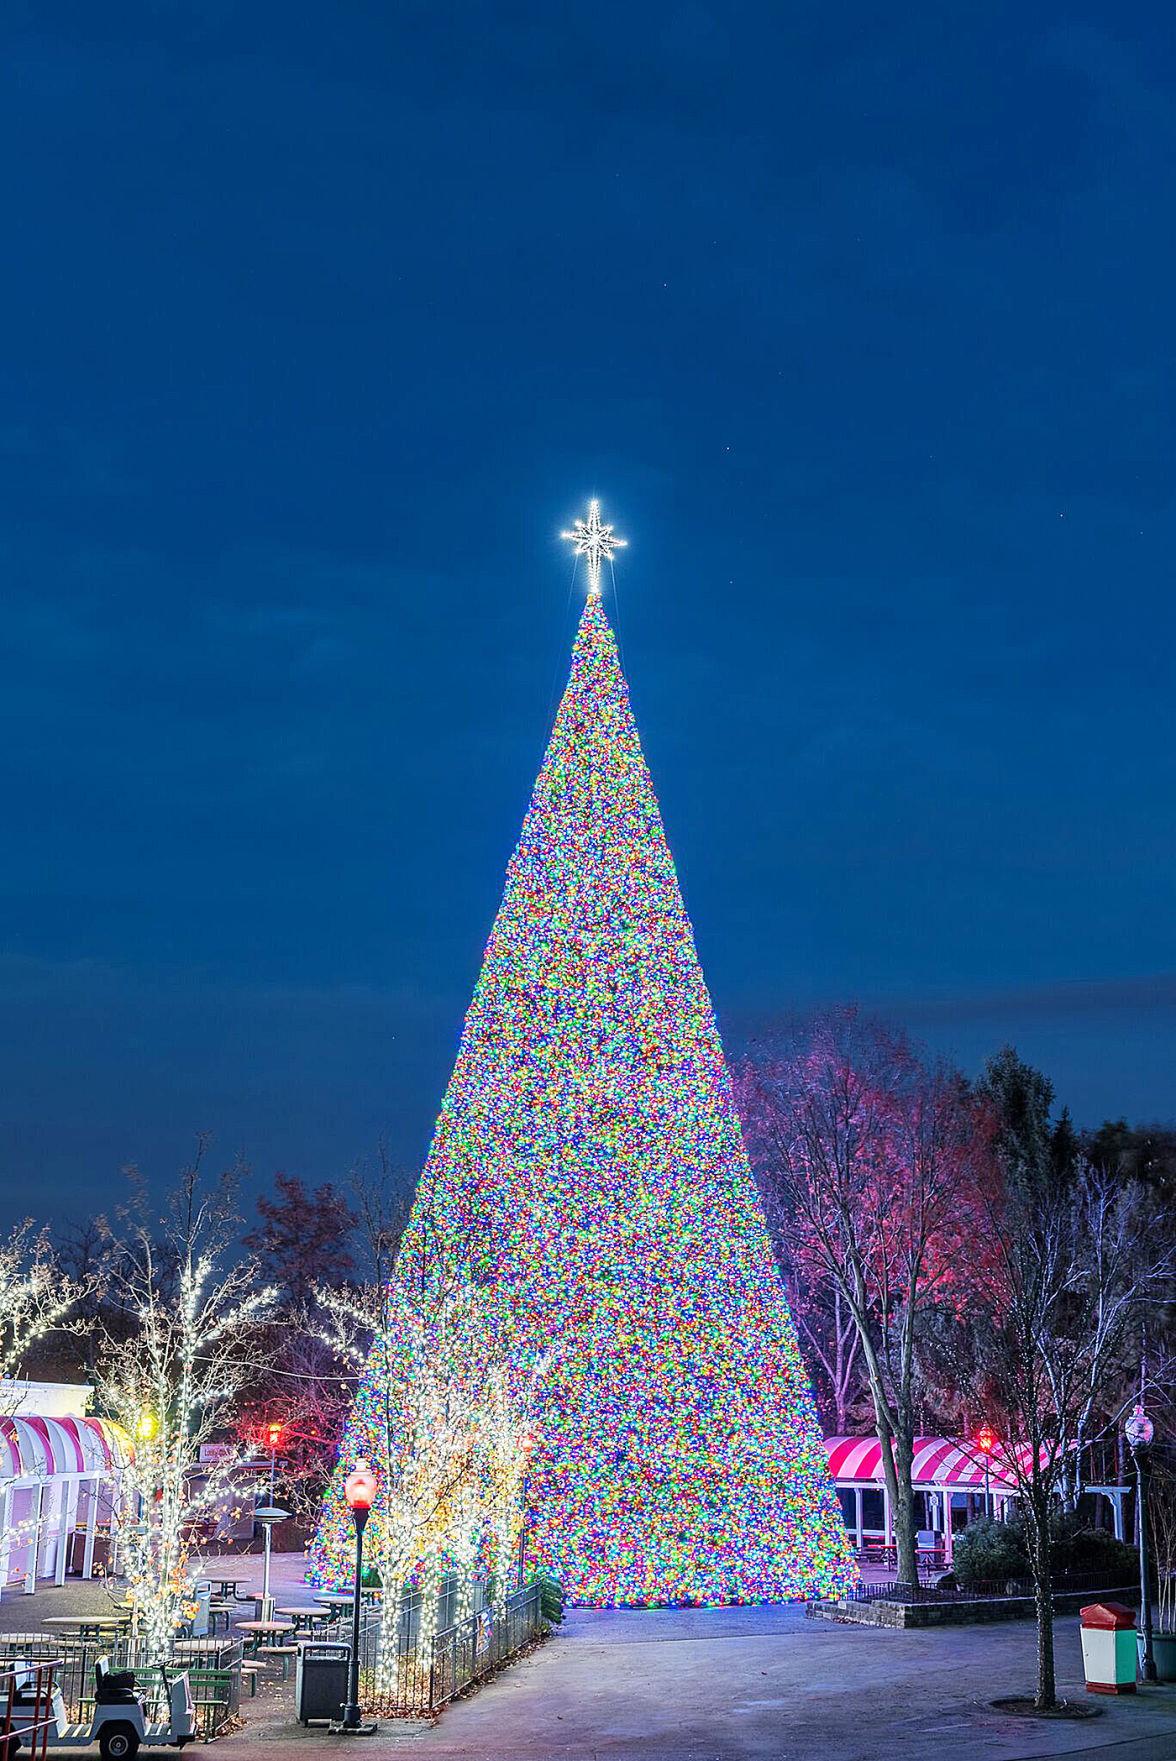 Kennywood lit for the holidays | Community | observer-reporter.com